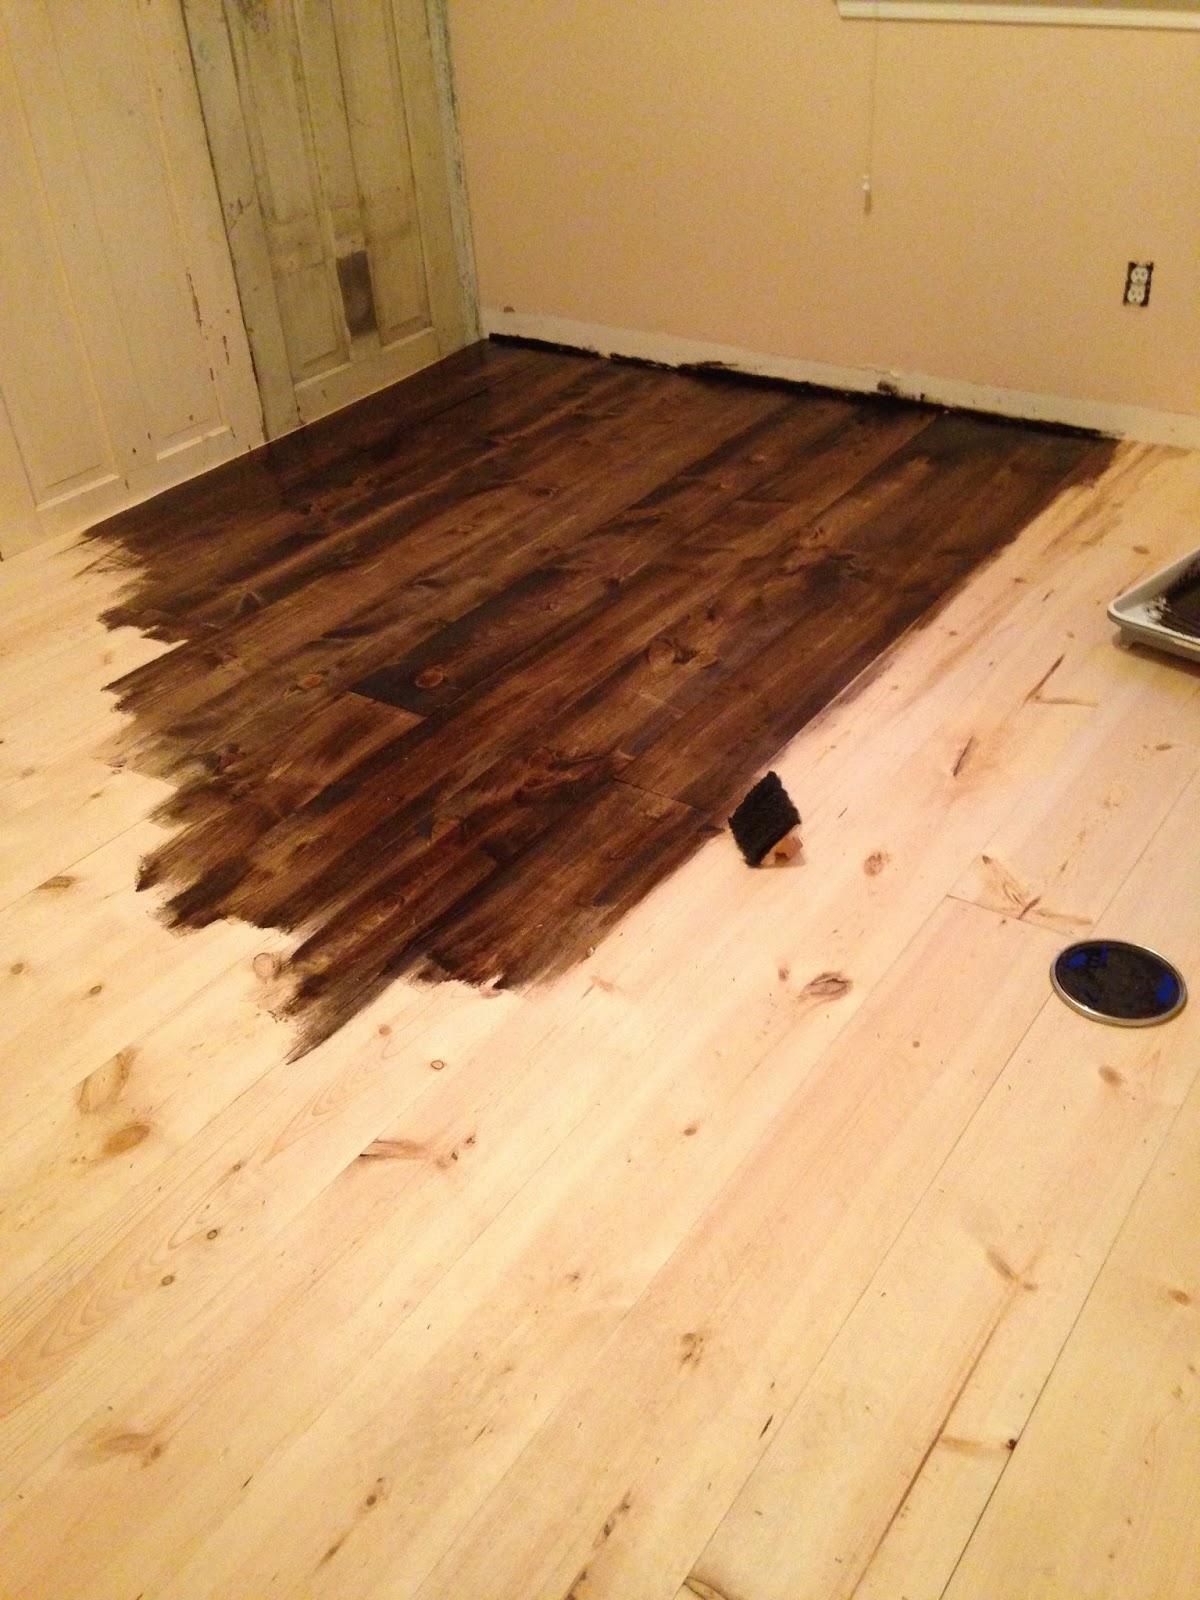 Grand Design DIY pine plank wood flooring